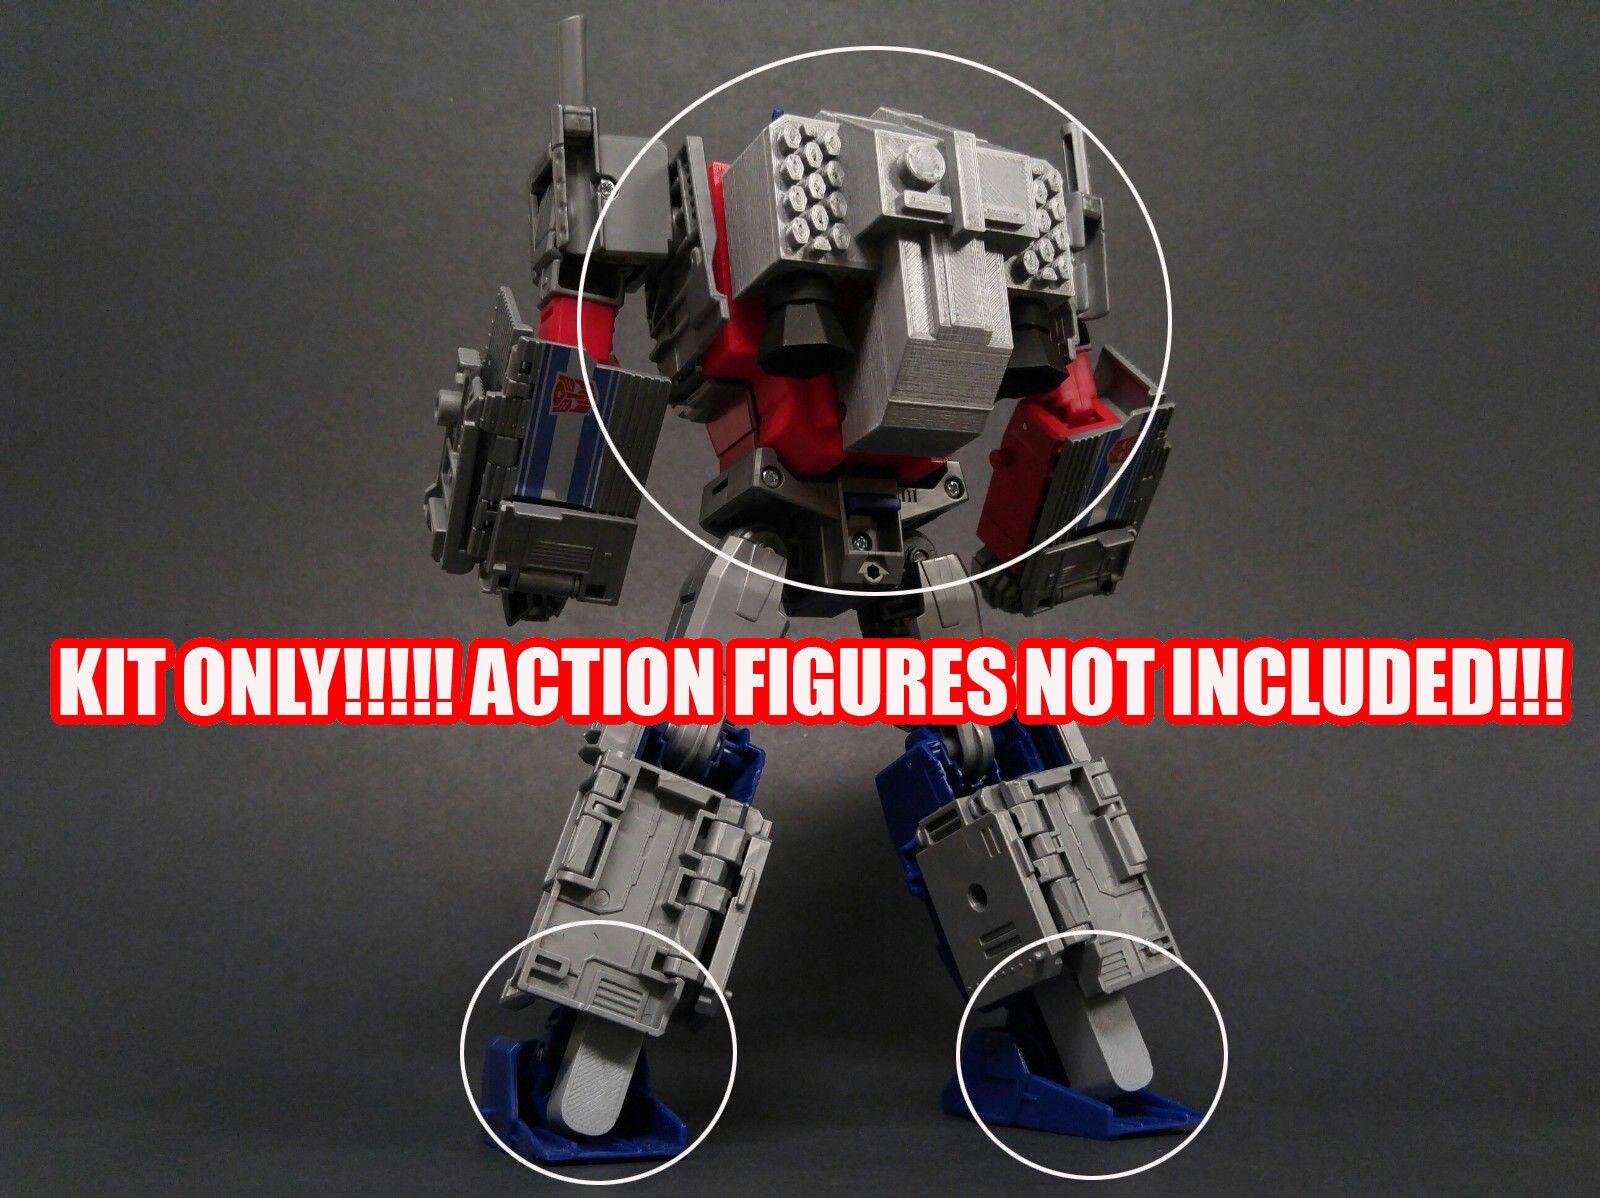 DSA-05 Transformers PotP Optimus Prime & Orion Pax Back & Jetpack kit.